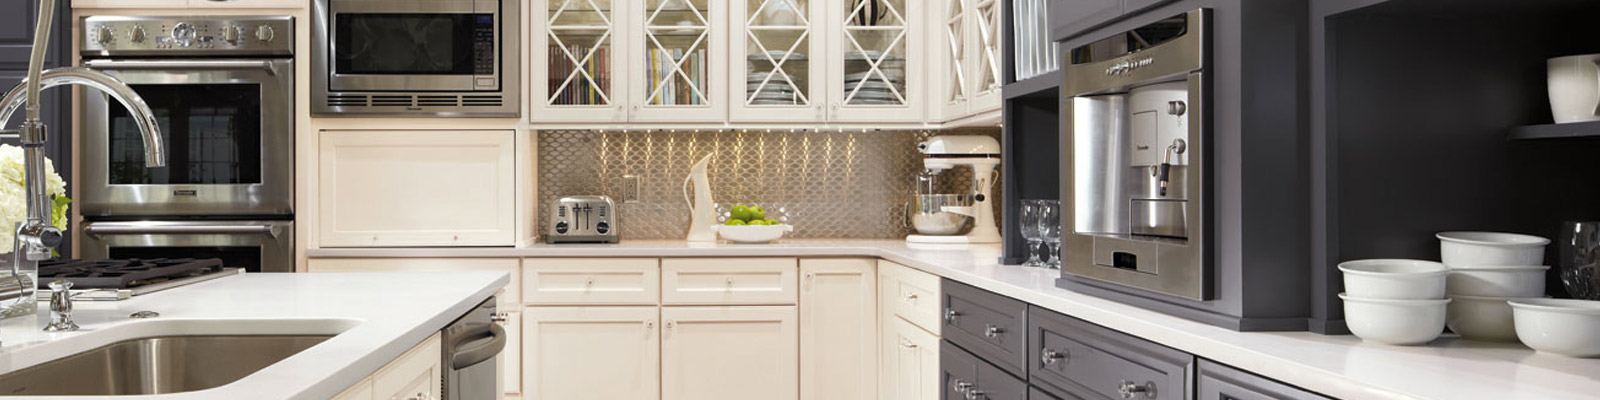 Kitchen Cabinets Counter Tops Kitchen Design Center - kitchen design center